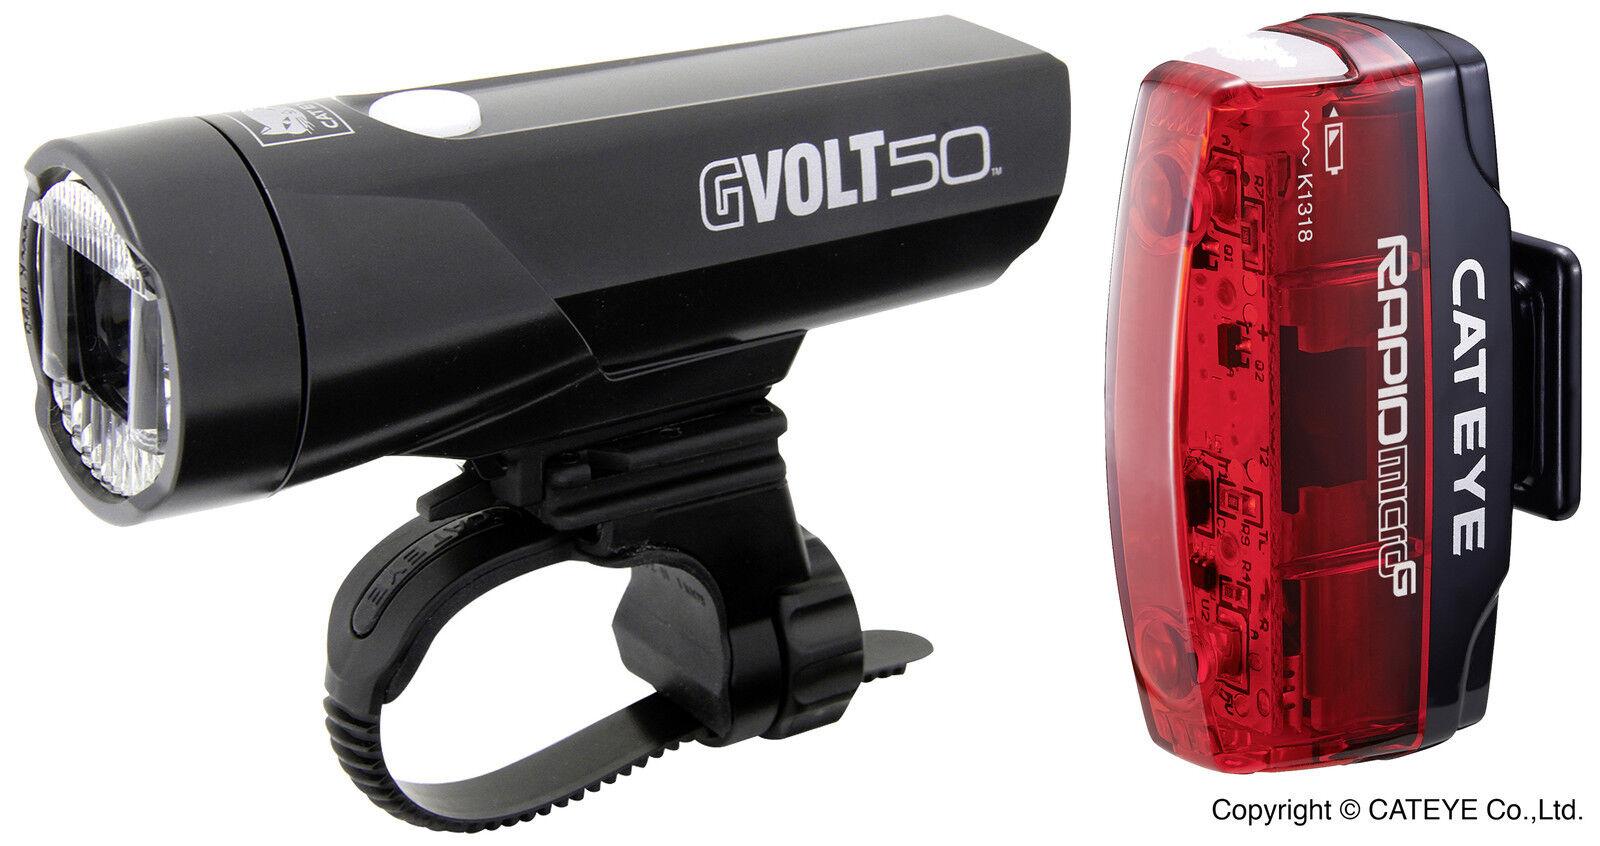 Cateye Beleuchtungskit GVolt 50 HL-EL550GRC + Rapid mit Micro G HL-EL620G mit Rapid Stvzo 5a5399